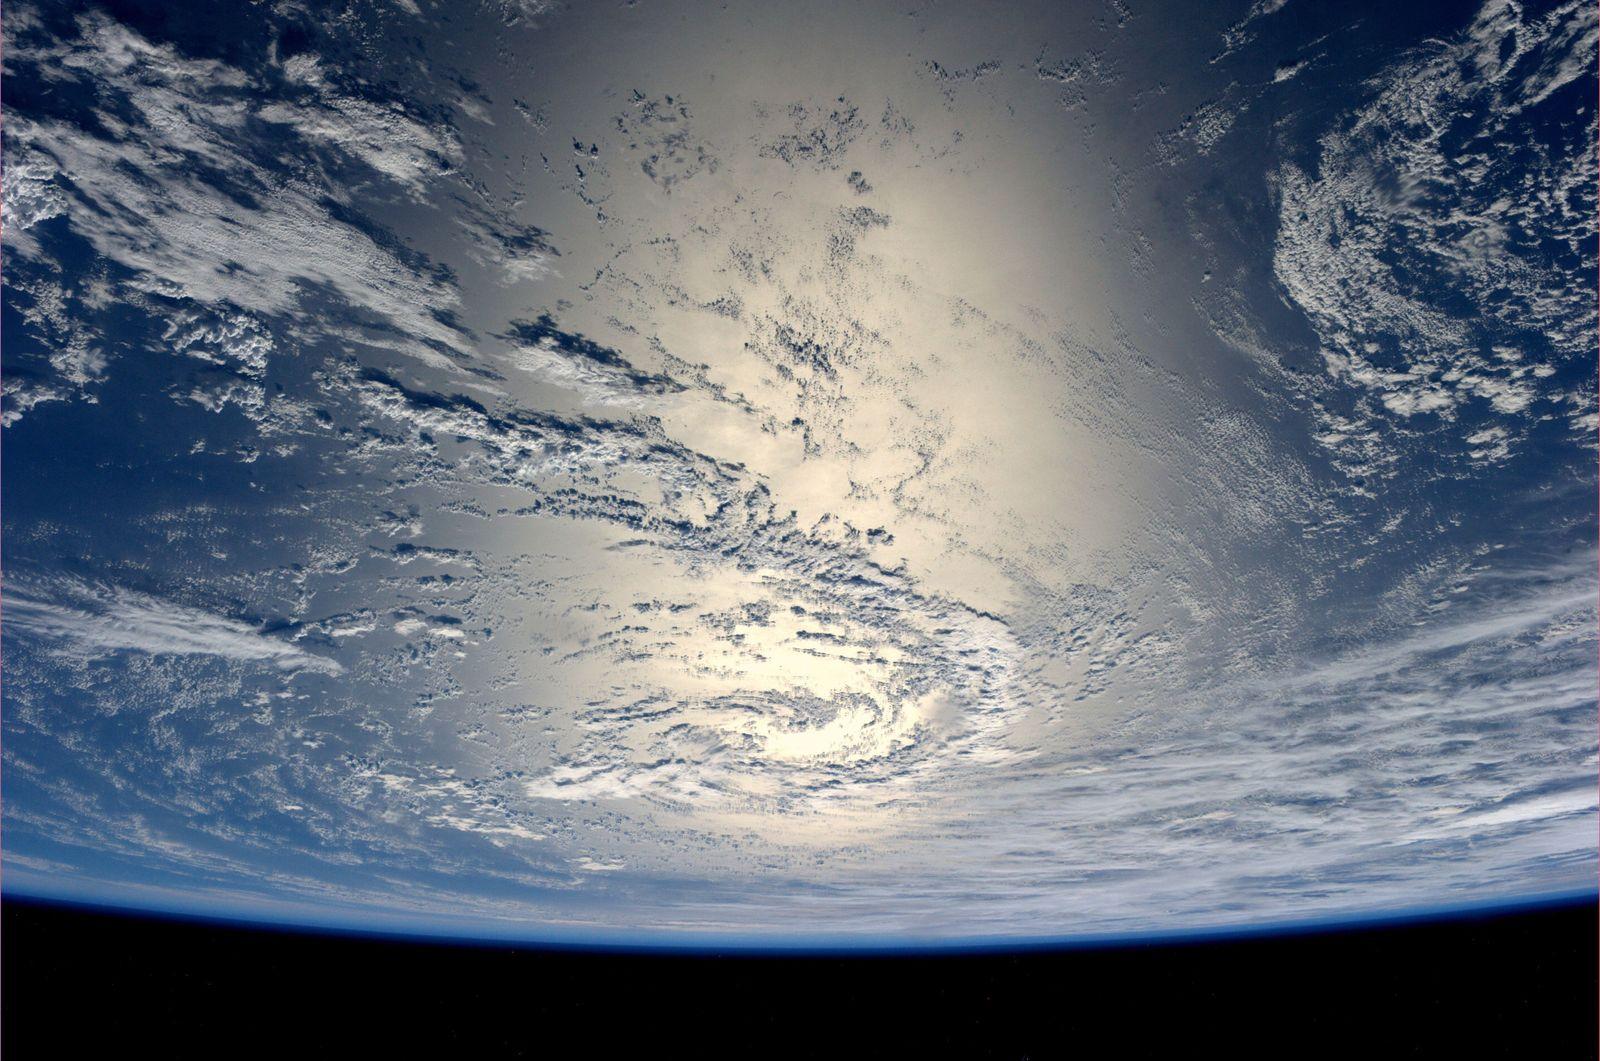 German Astronaut Alexander Gerst Aboard The International Space Station